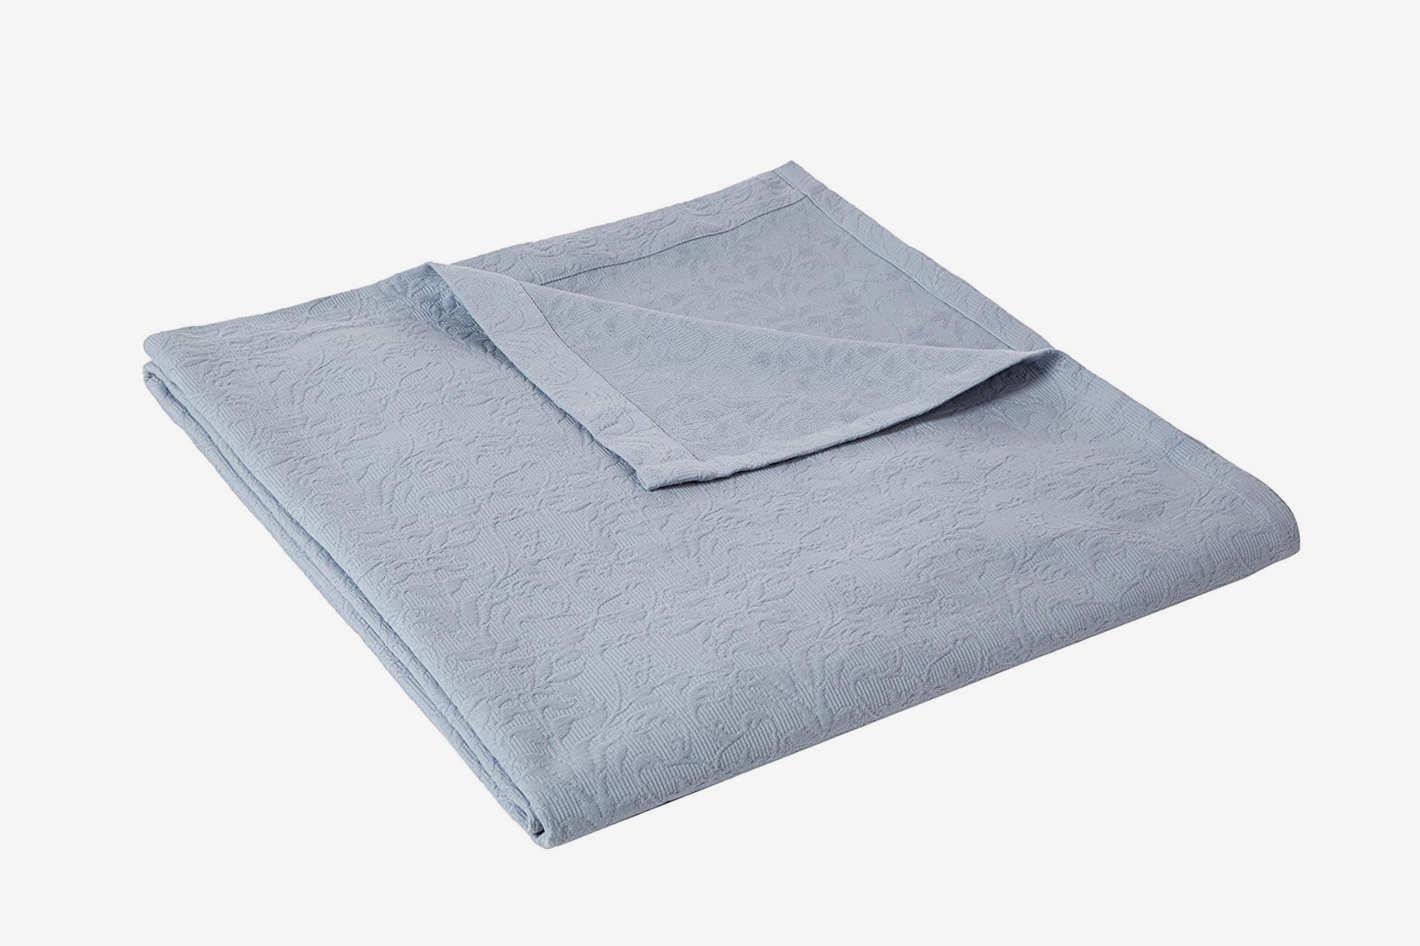 Pinzon Ivy Matelasse Cotton Coverlet, Full/Queen, Dusty Blue